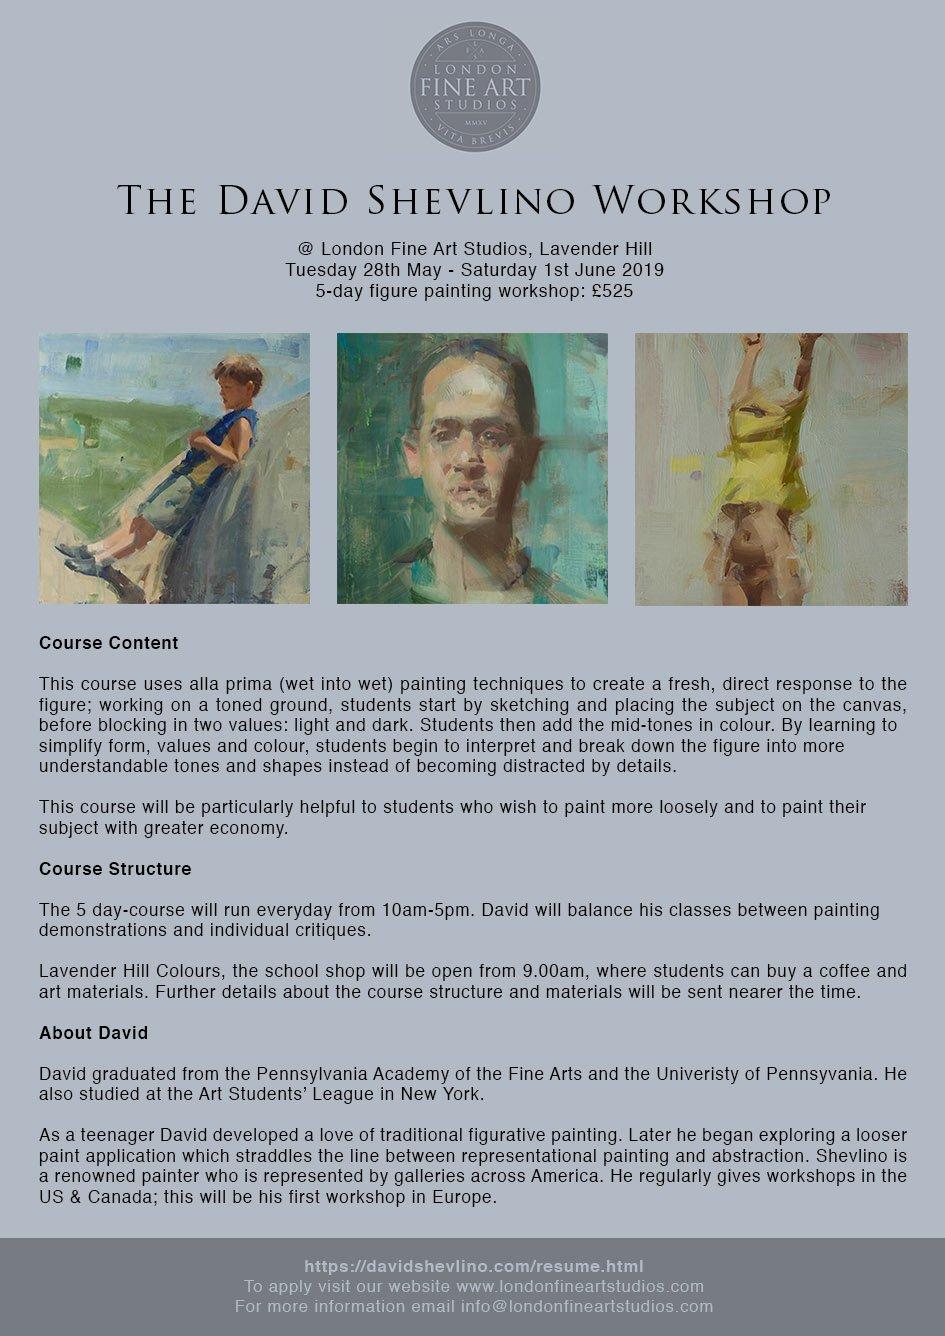 David Shevlino London Art Workshop